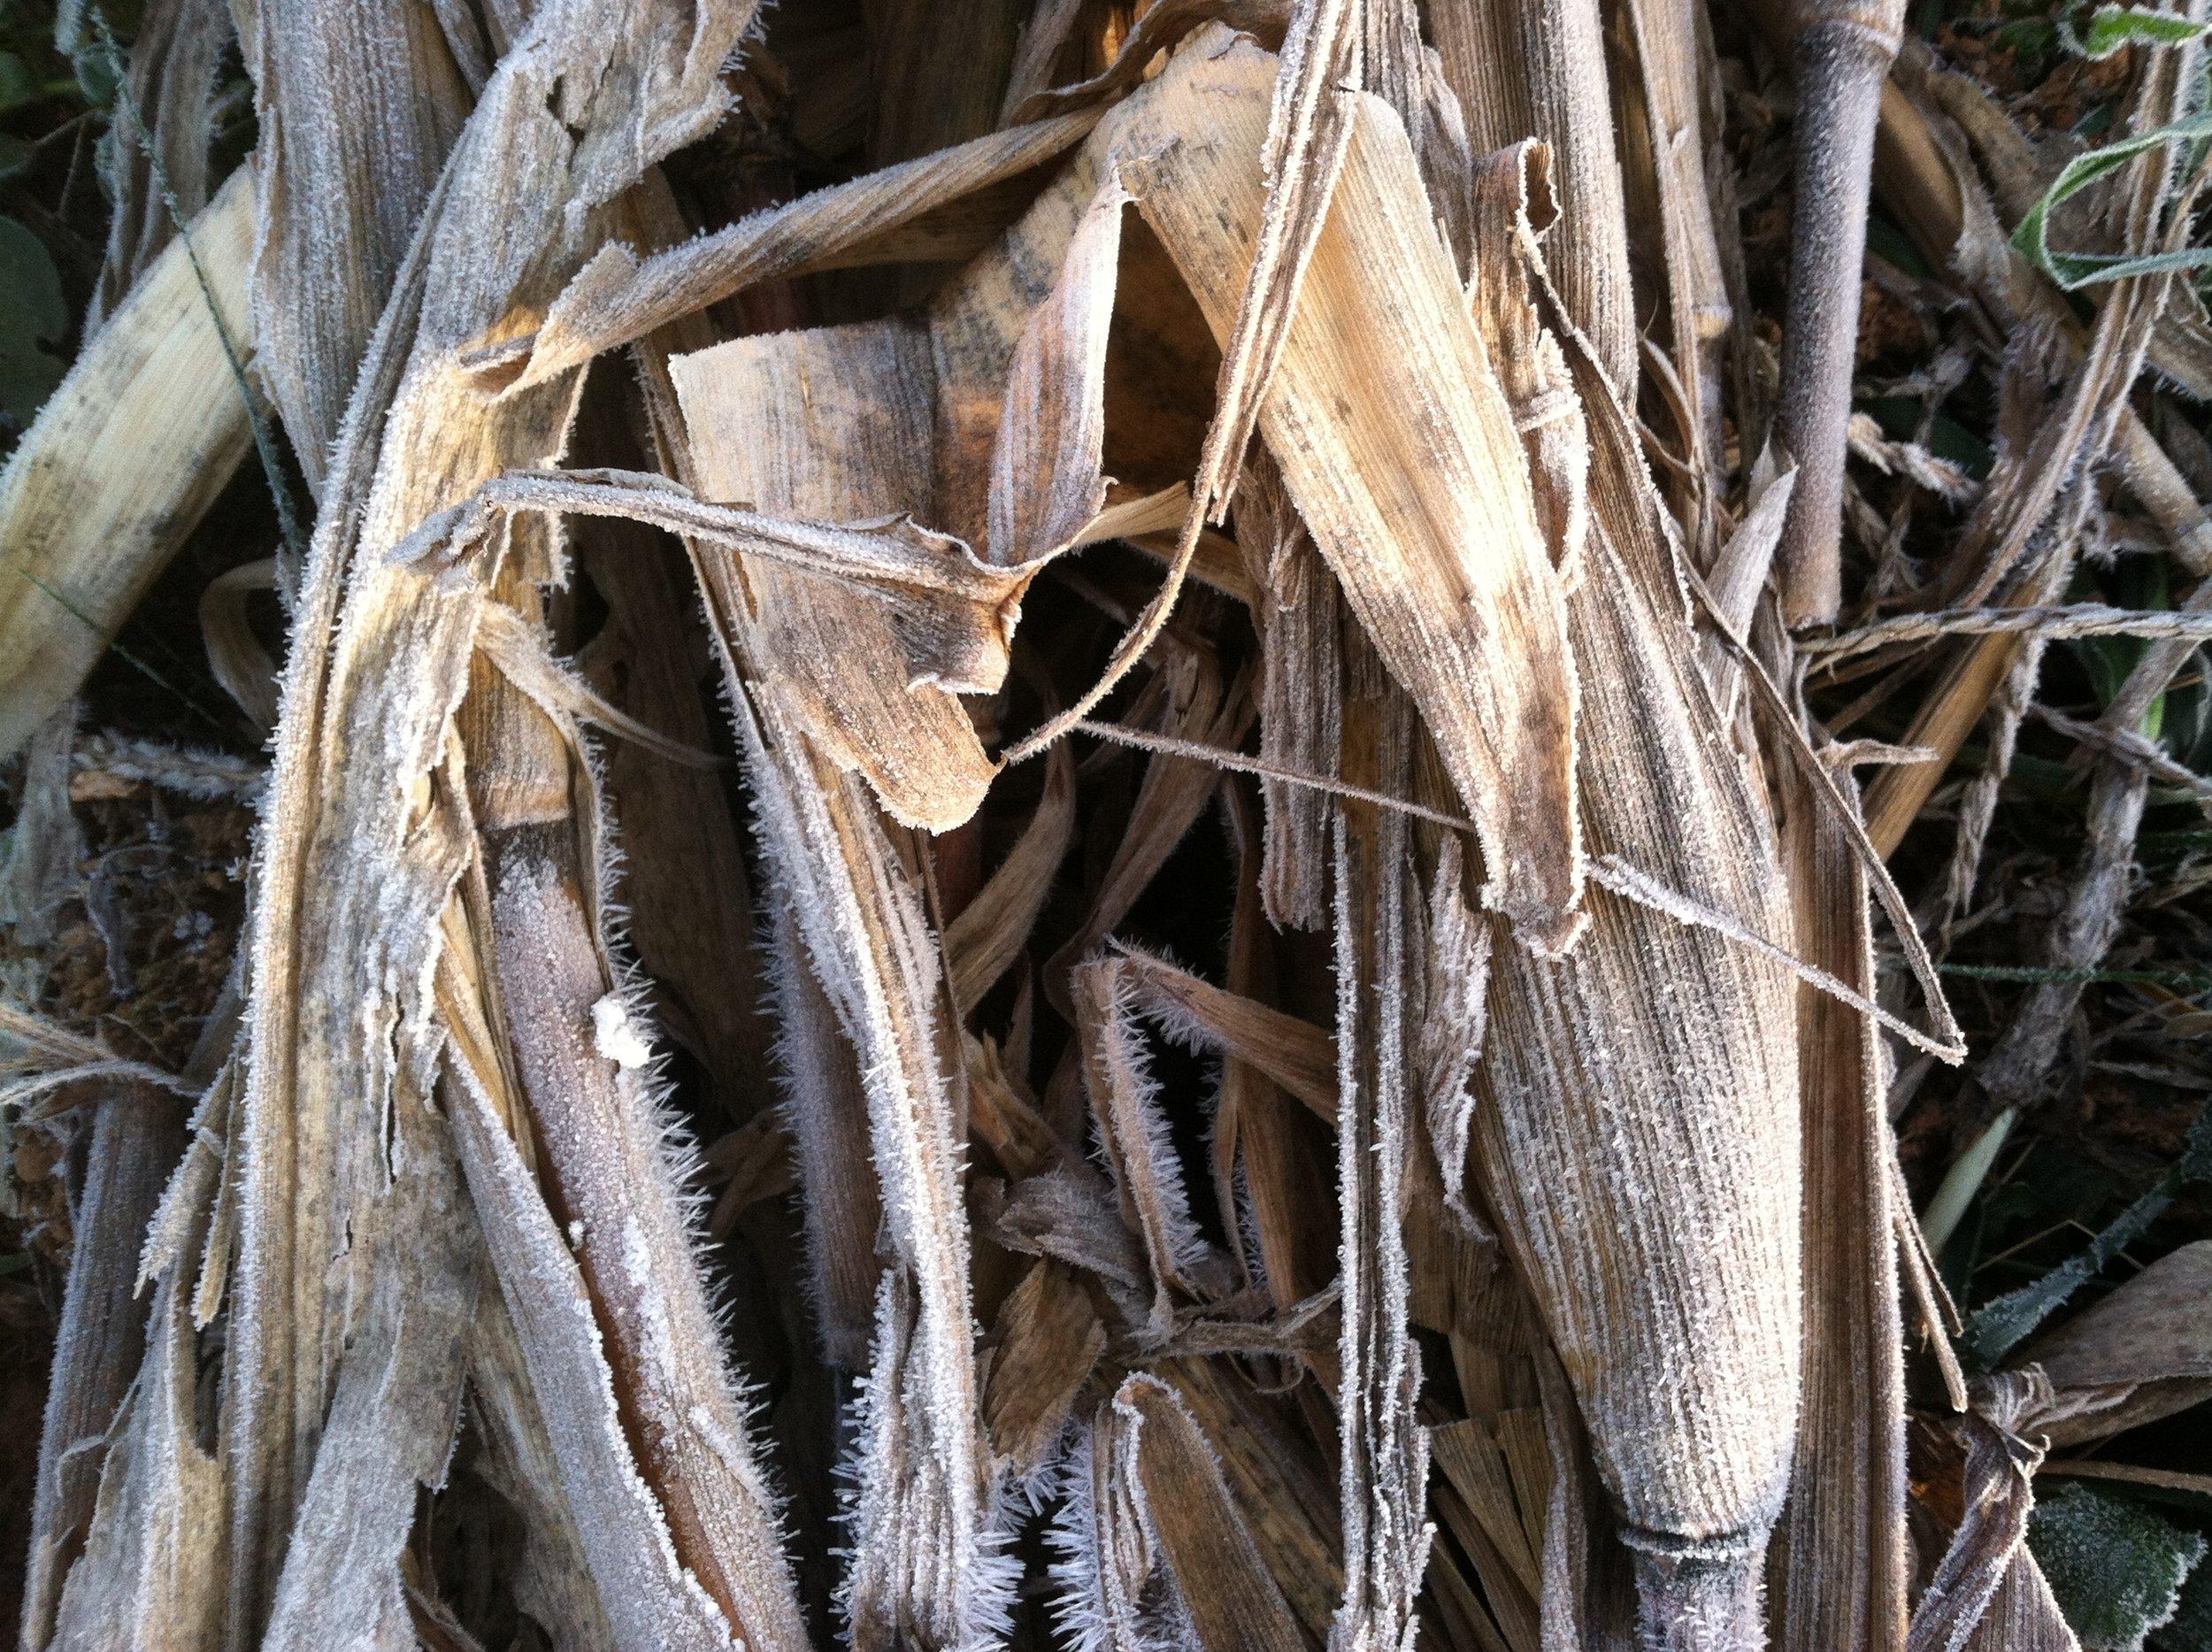 Popcorn stalks laid down.